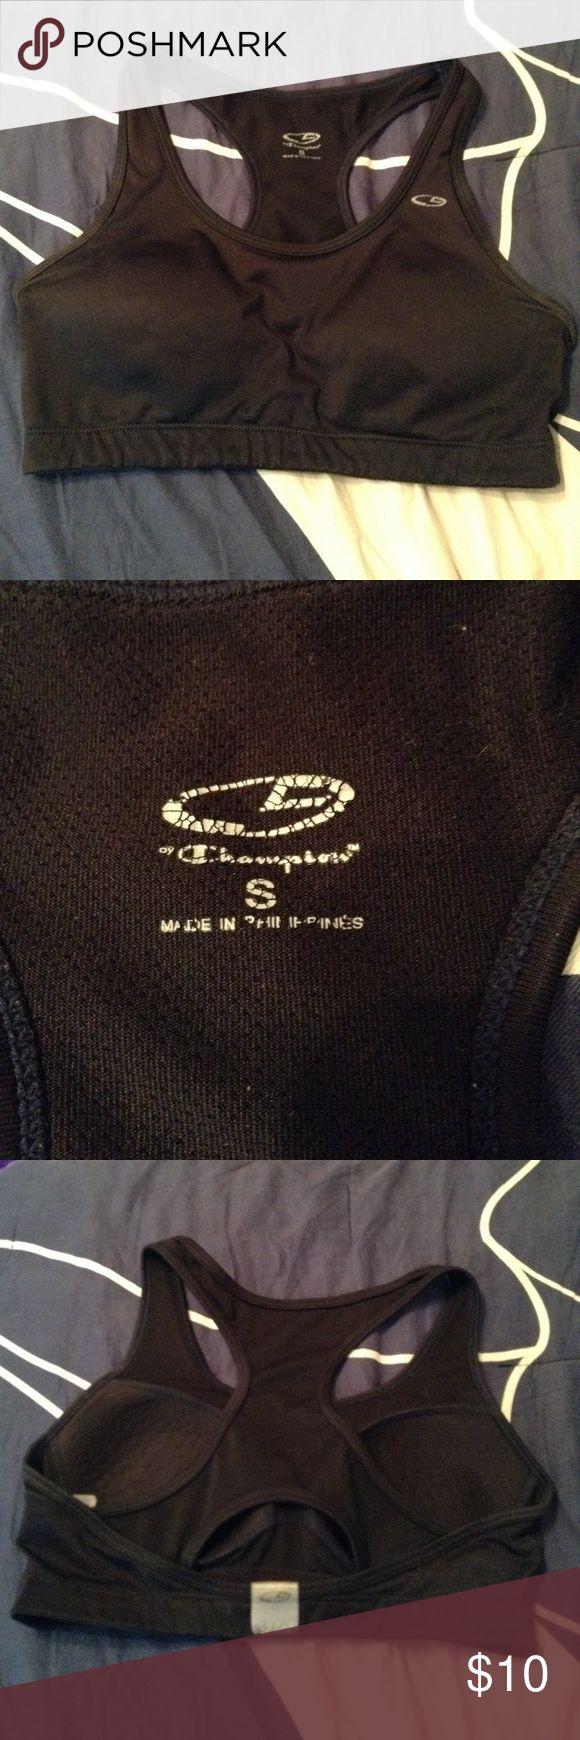 Black Champion Sports Bra Champion sports bra, size Small. Lightly padded. Great for running, the gym, or sports! Champion Intimates & Sleepwear Bras